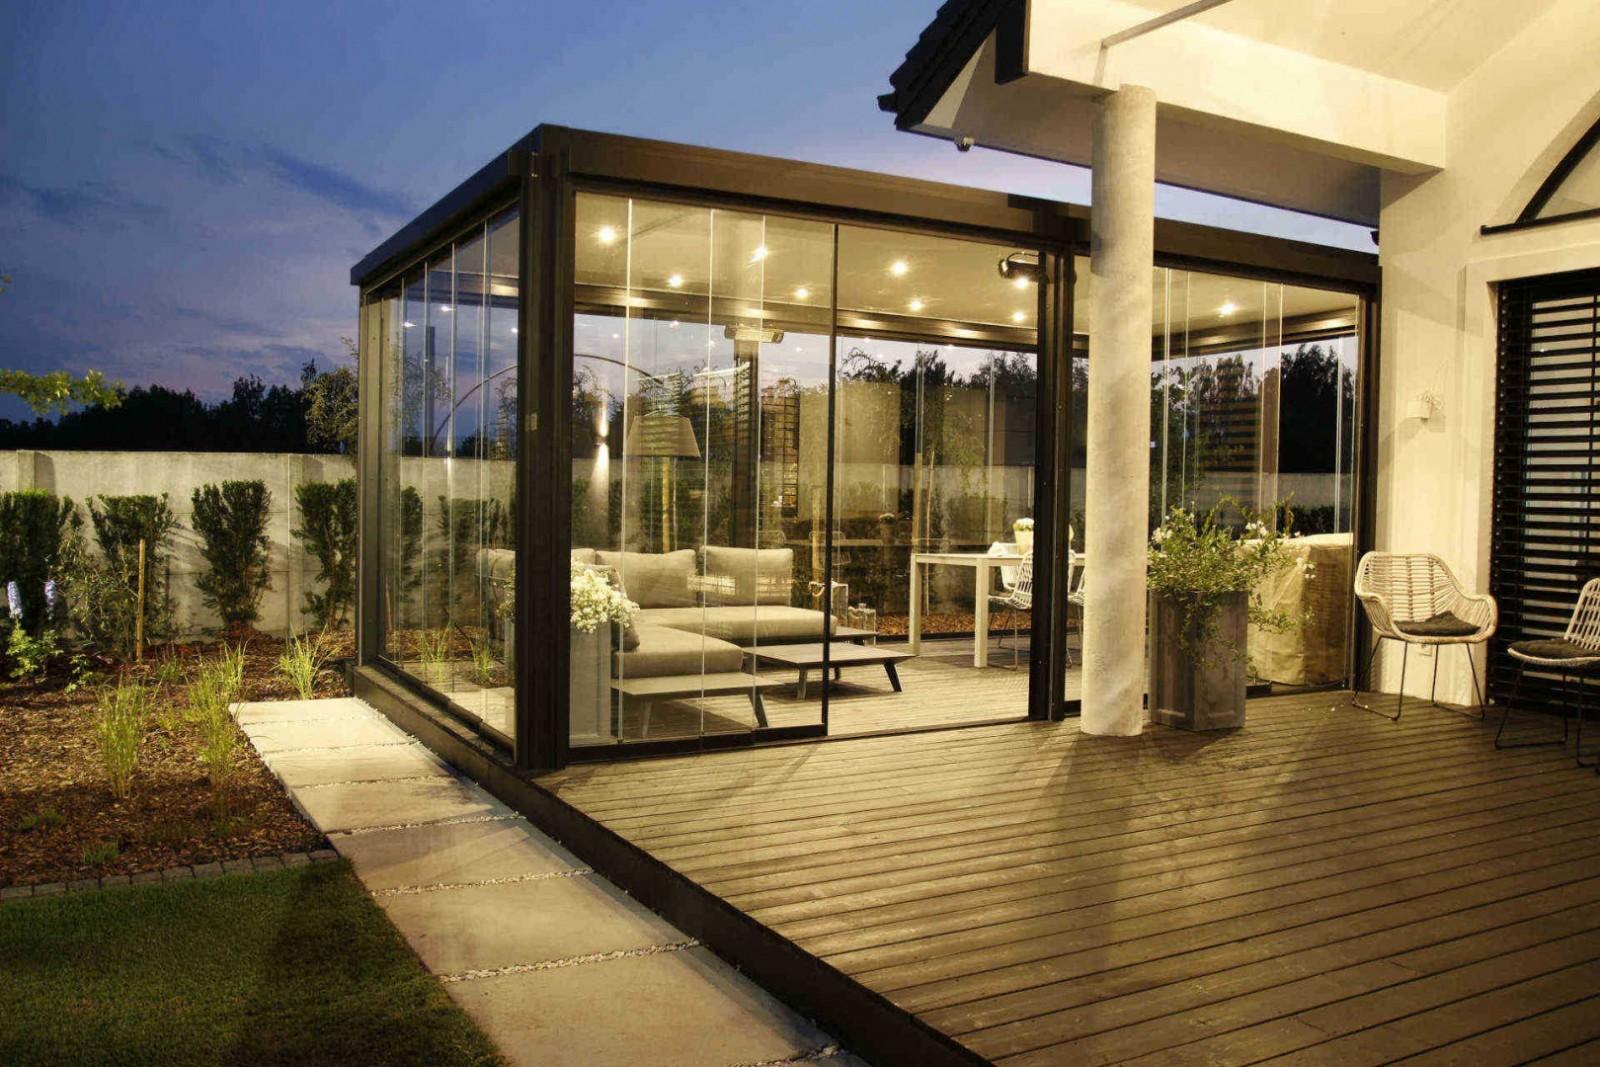 Lamellendach Pergola Sonnenschutz Terrasse freistehend